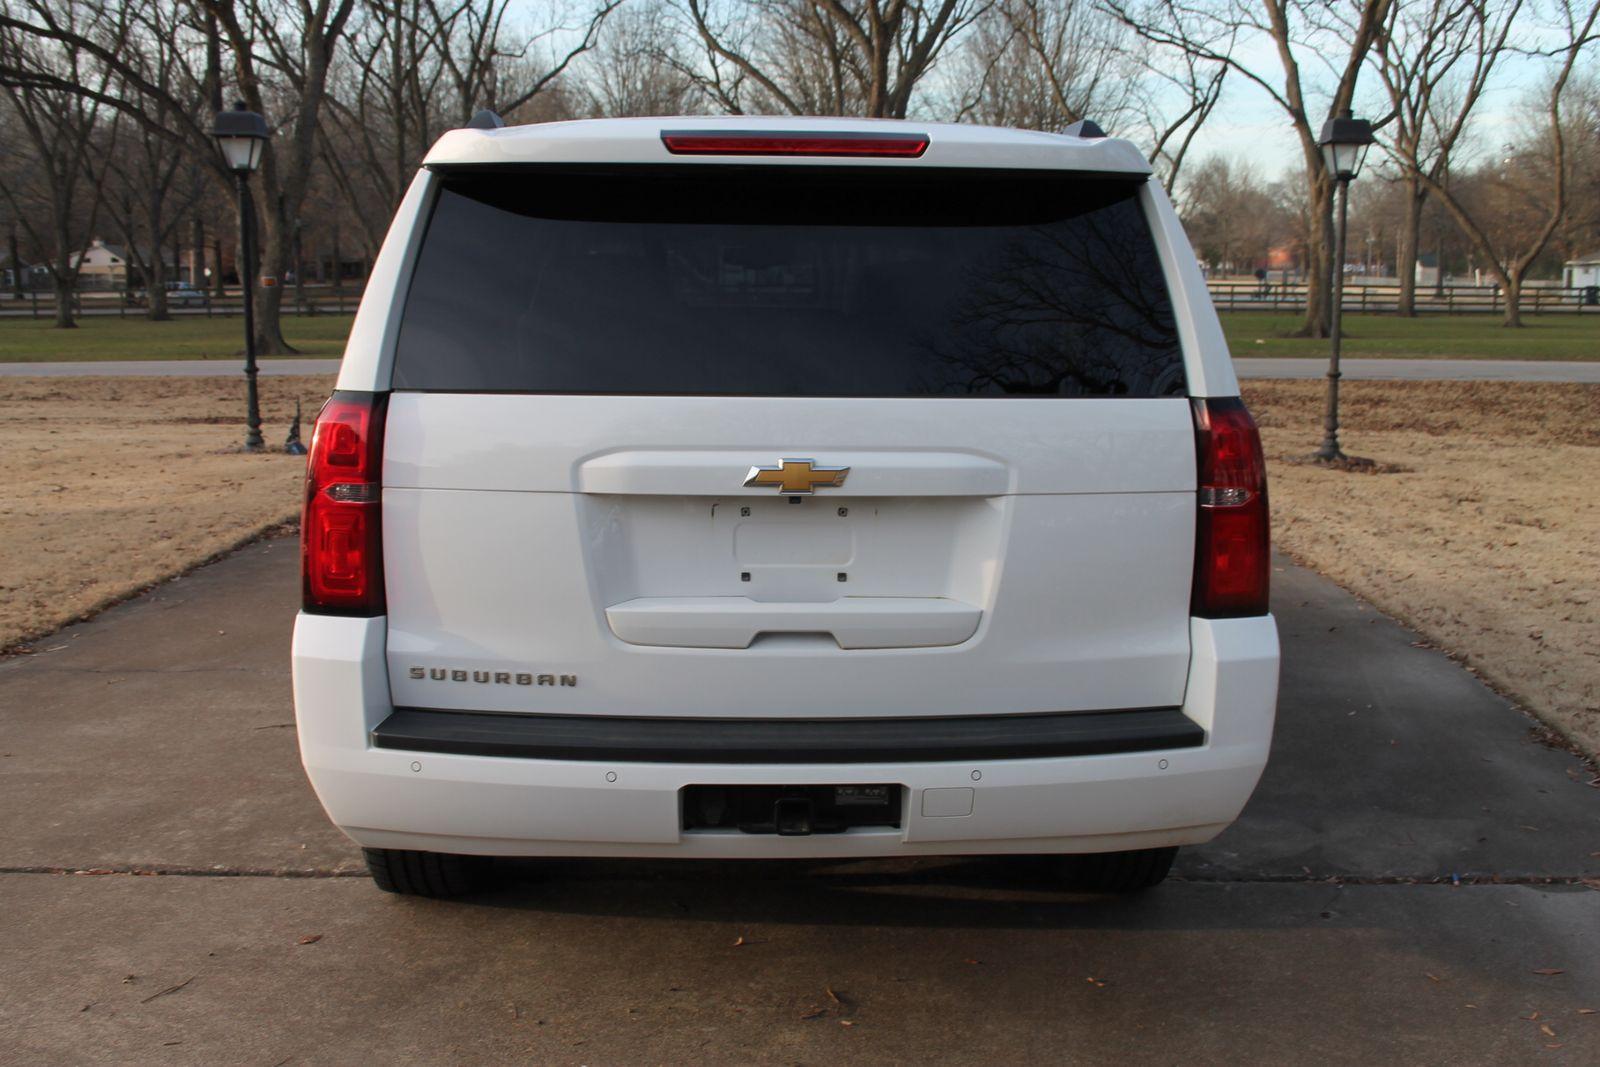 2015 Chevrolet Suburban Lt Price Used Cars Memphis Hallum Motors Remote Starter Shevi Autos Post Citystatezip In Marion